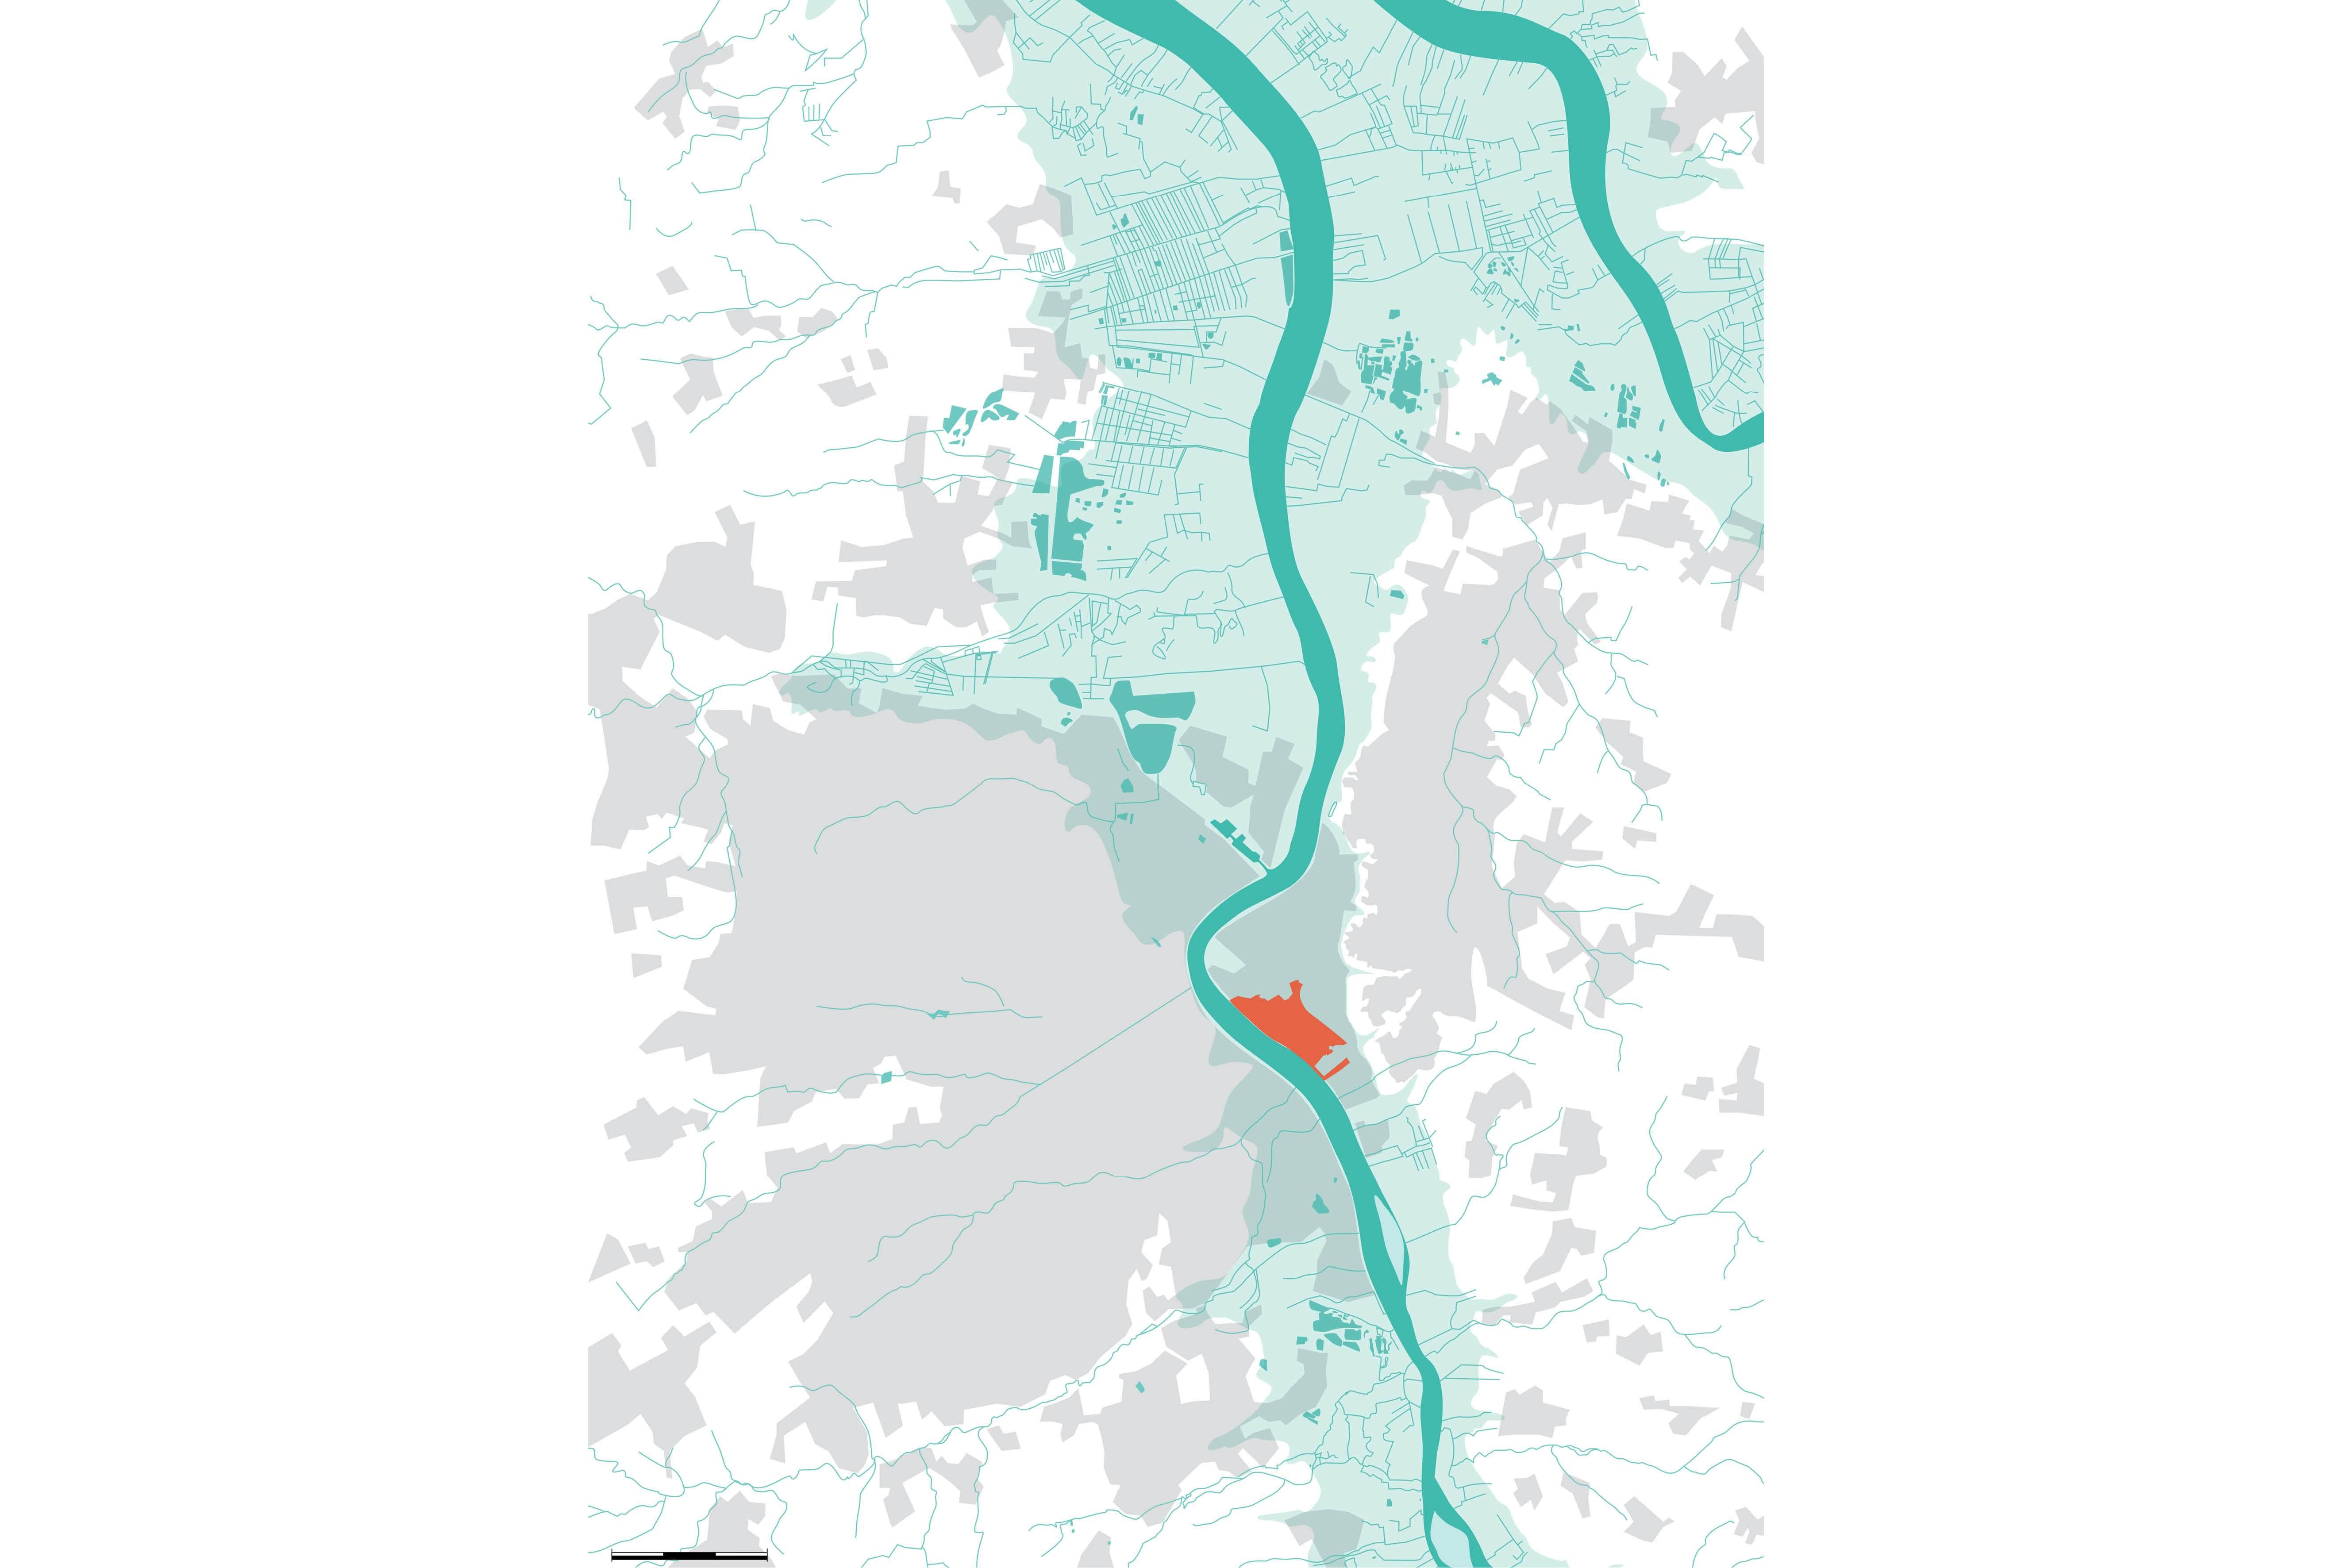 Garonne-Eiffel District - taktyk